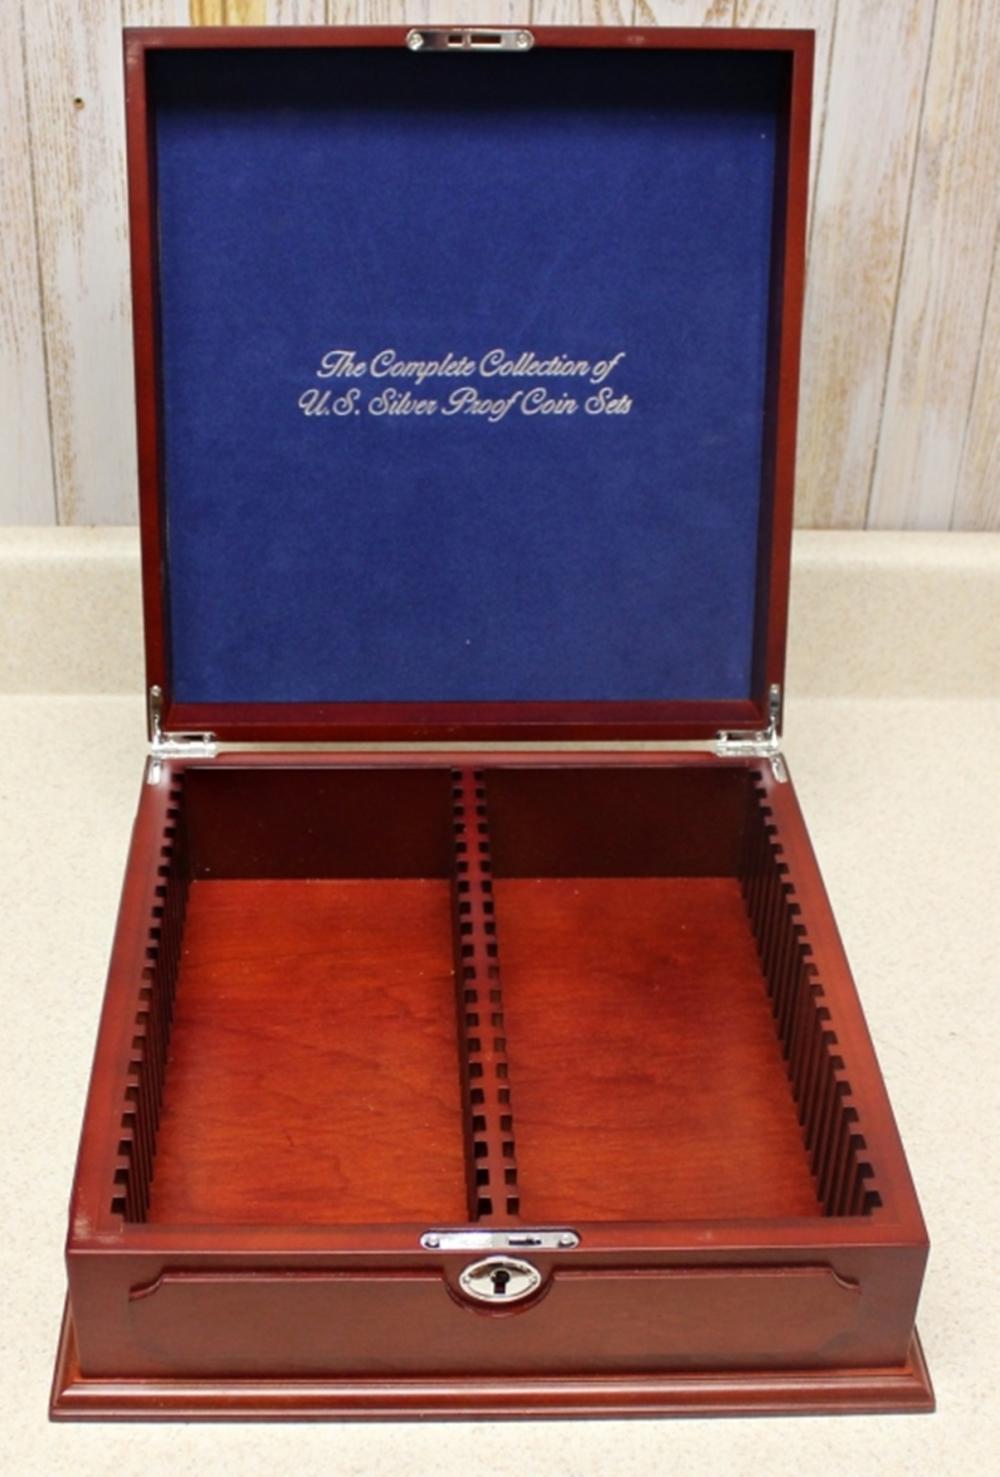 BEAUTIFUL WOODEN DISPLAY BOX